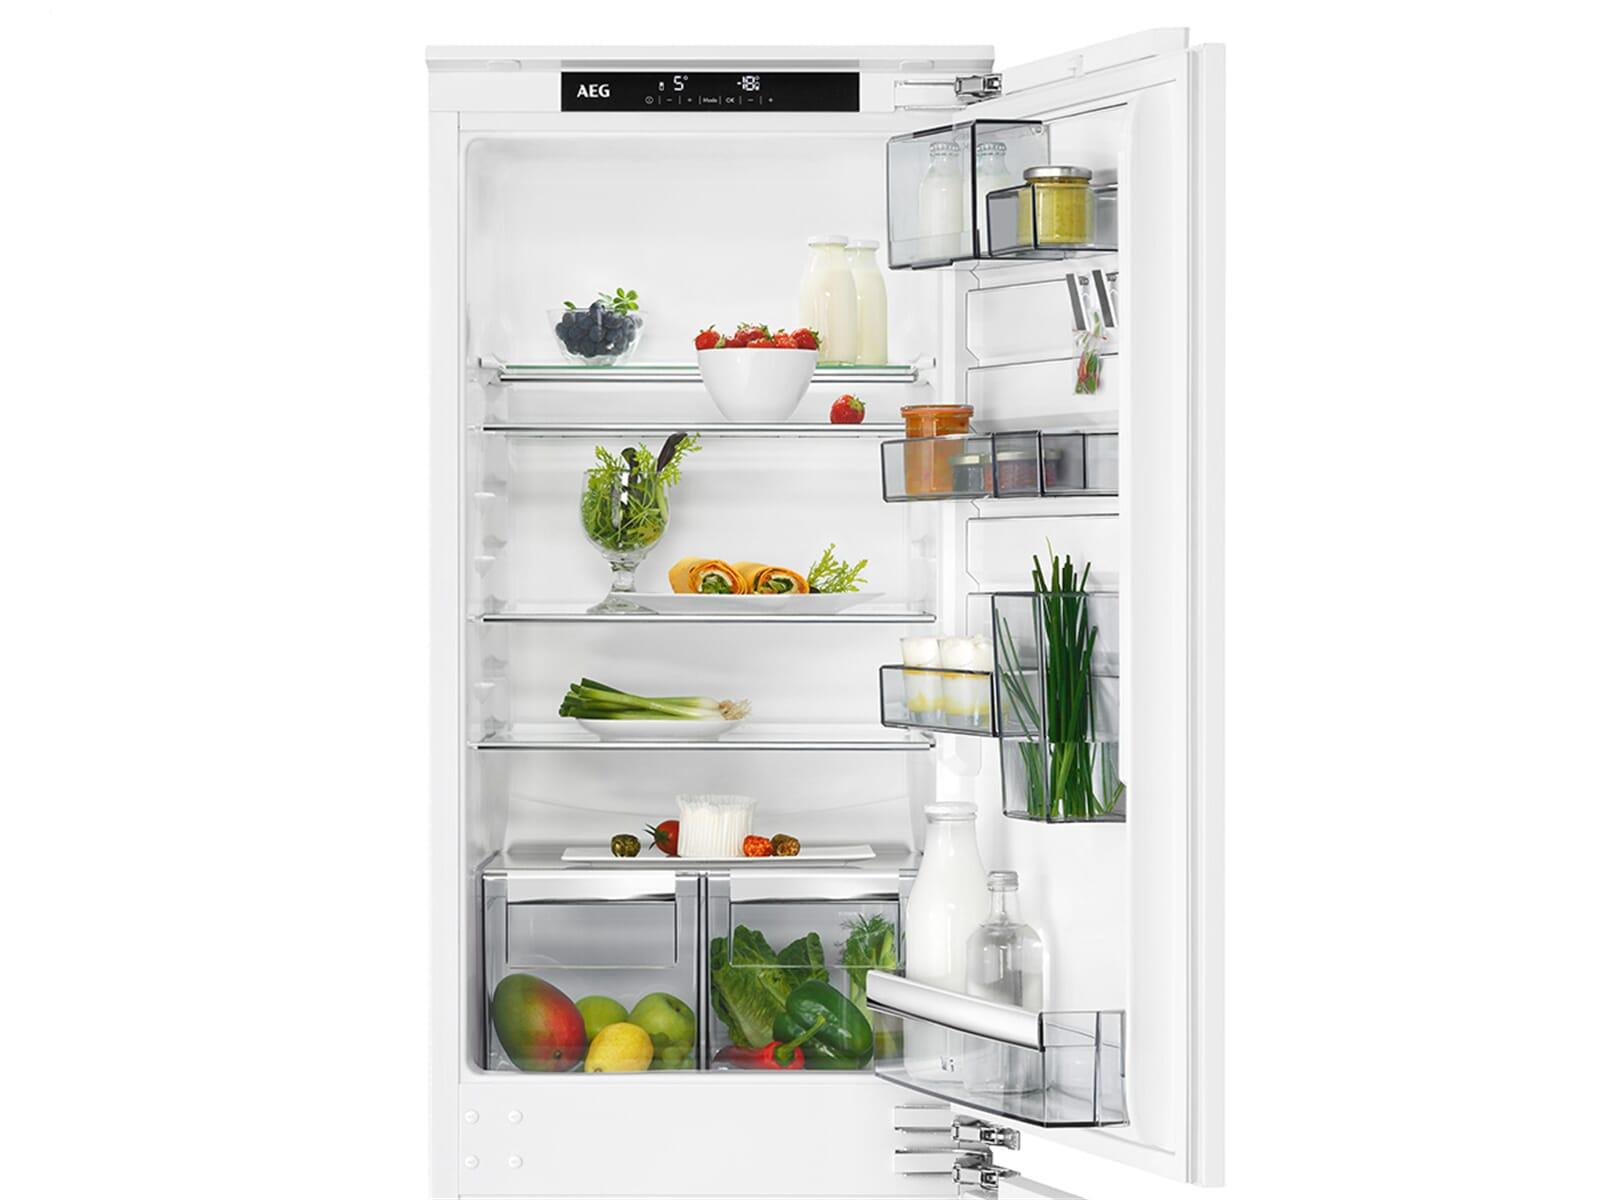 Aeg Kühlschrank Festtür Montage : Aeg sce nc einbau kühl gefrierkombination